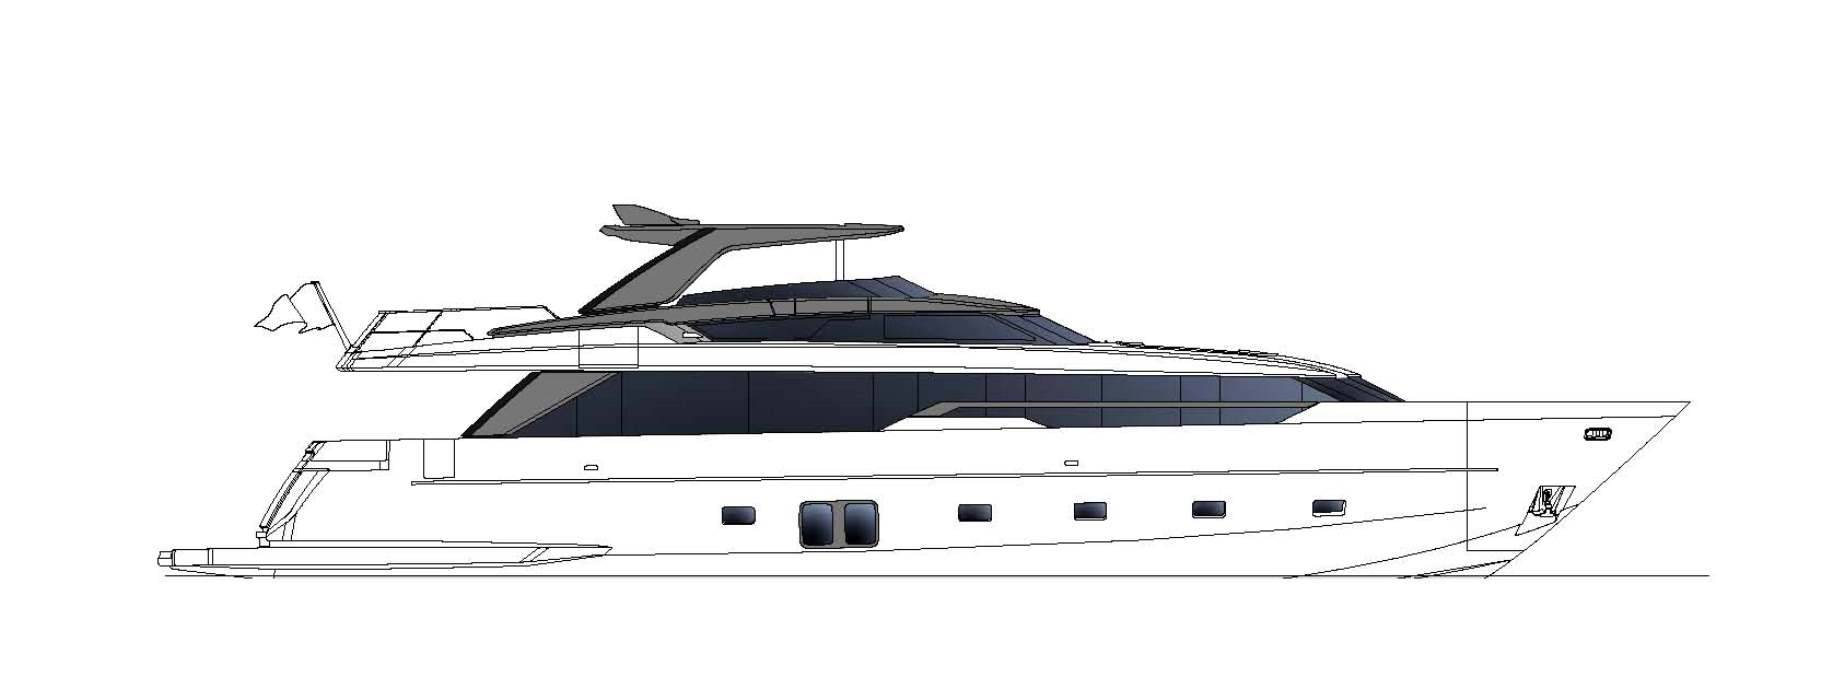 Sanlorenzo Yachts SL96 Asymmetric Профиль